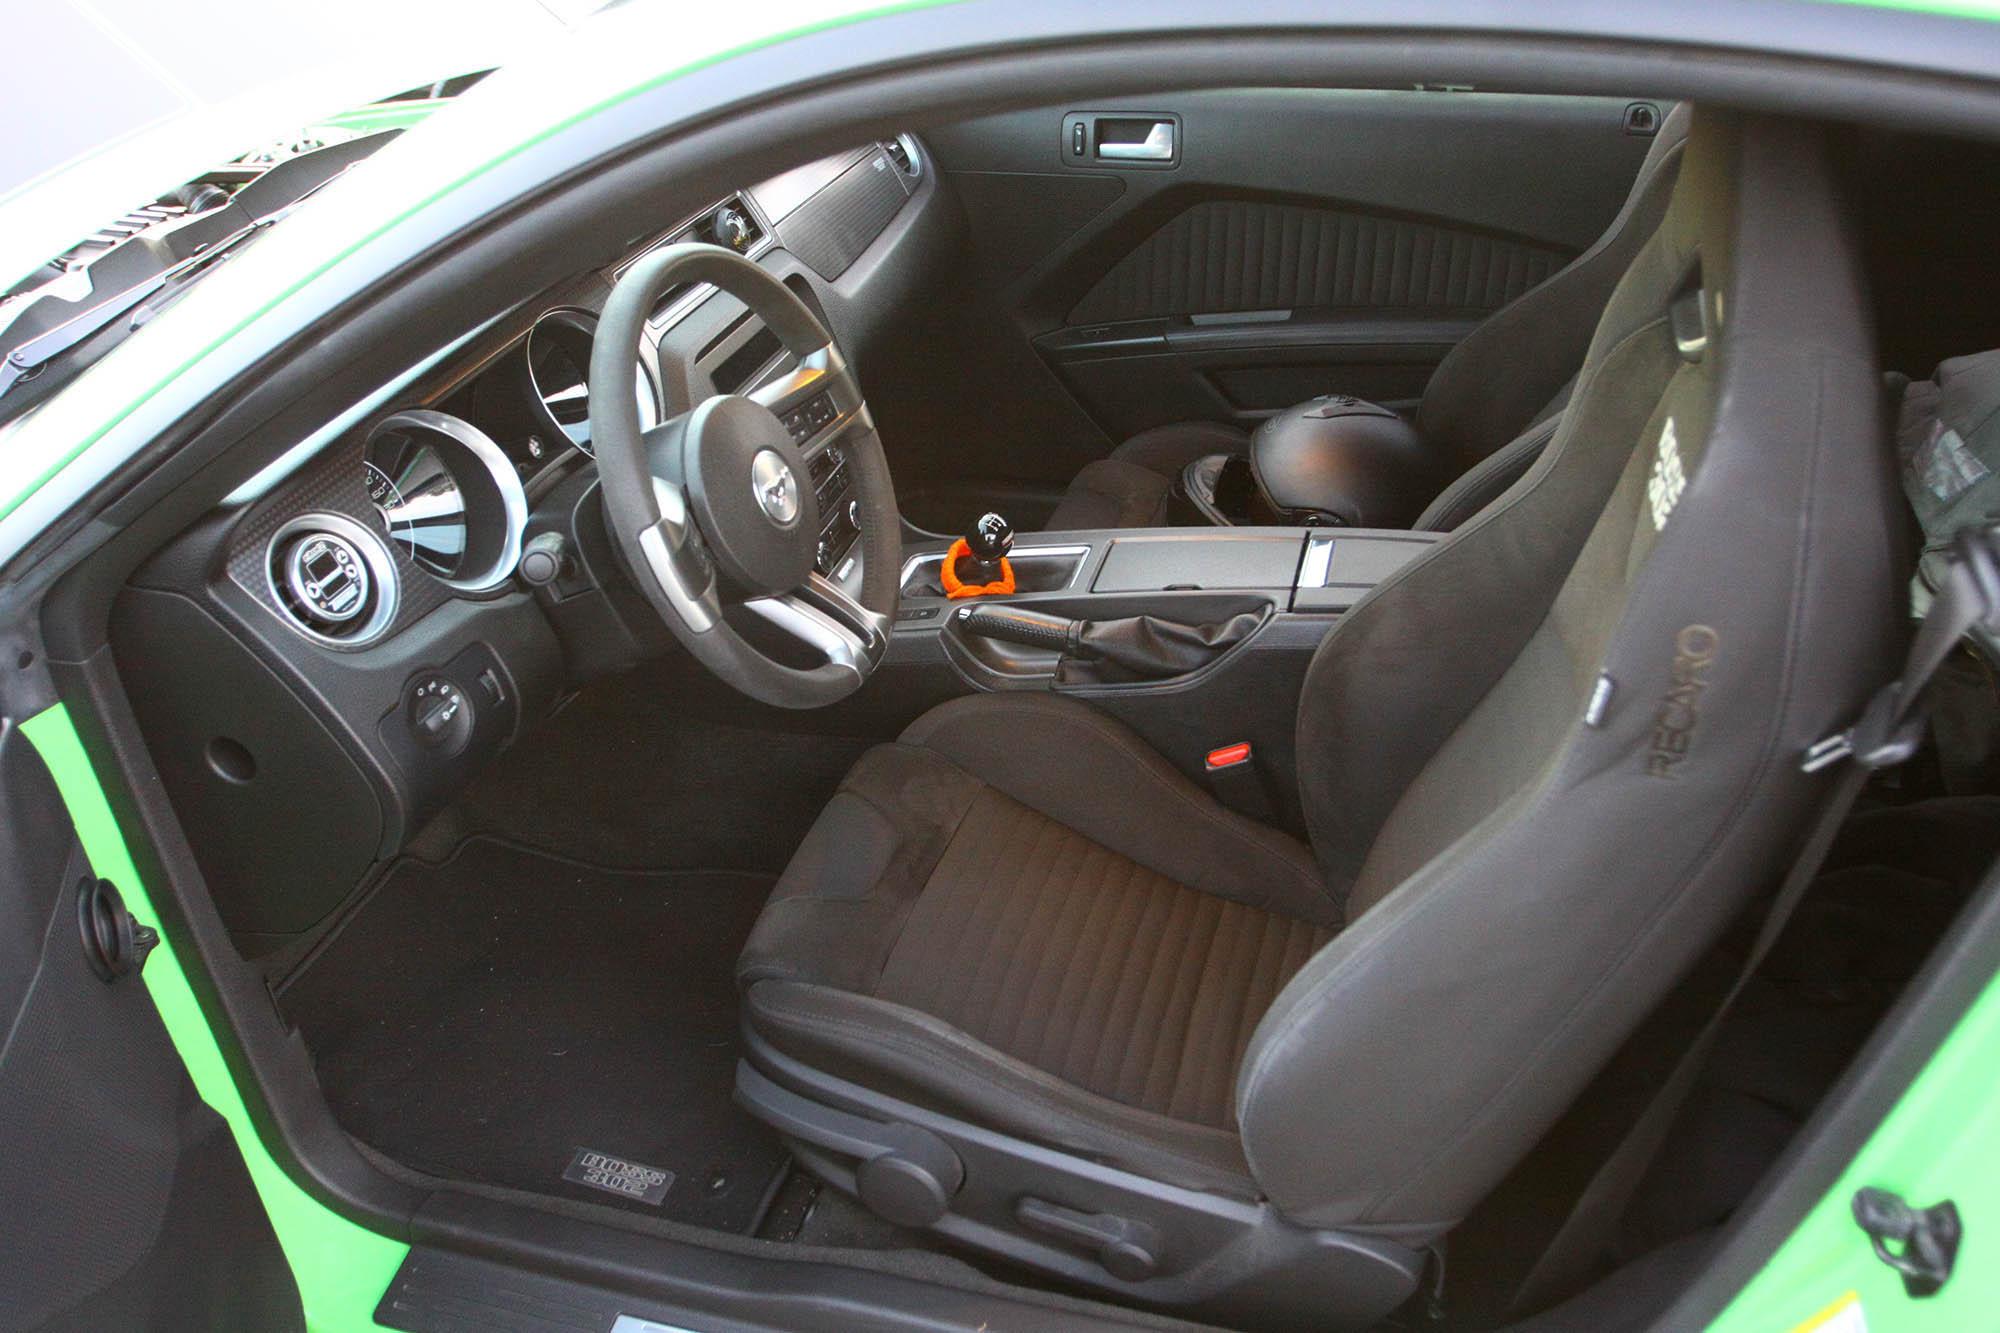 2013 Boss 302 interior